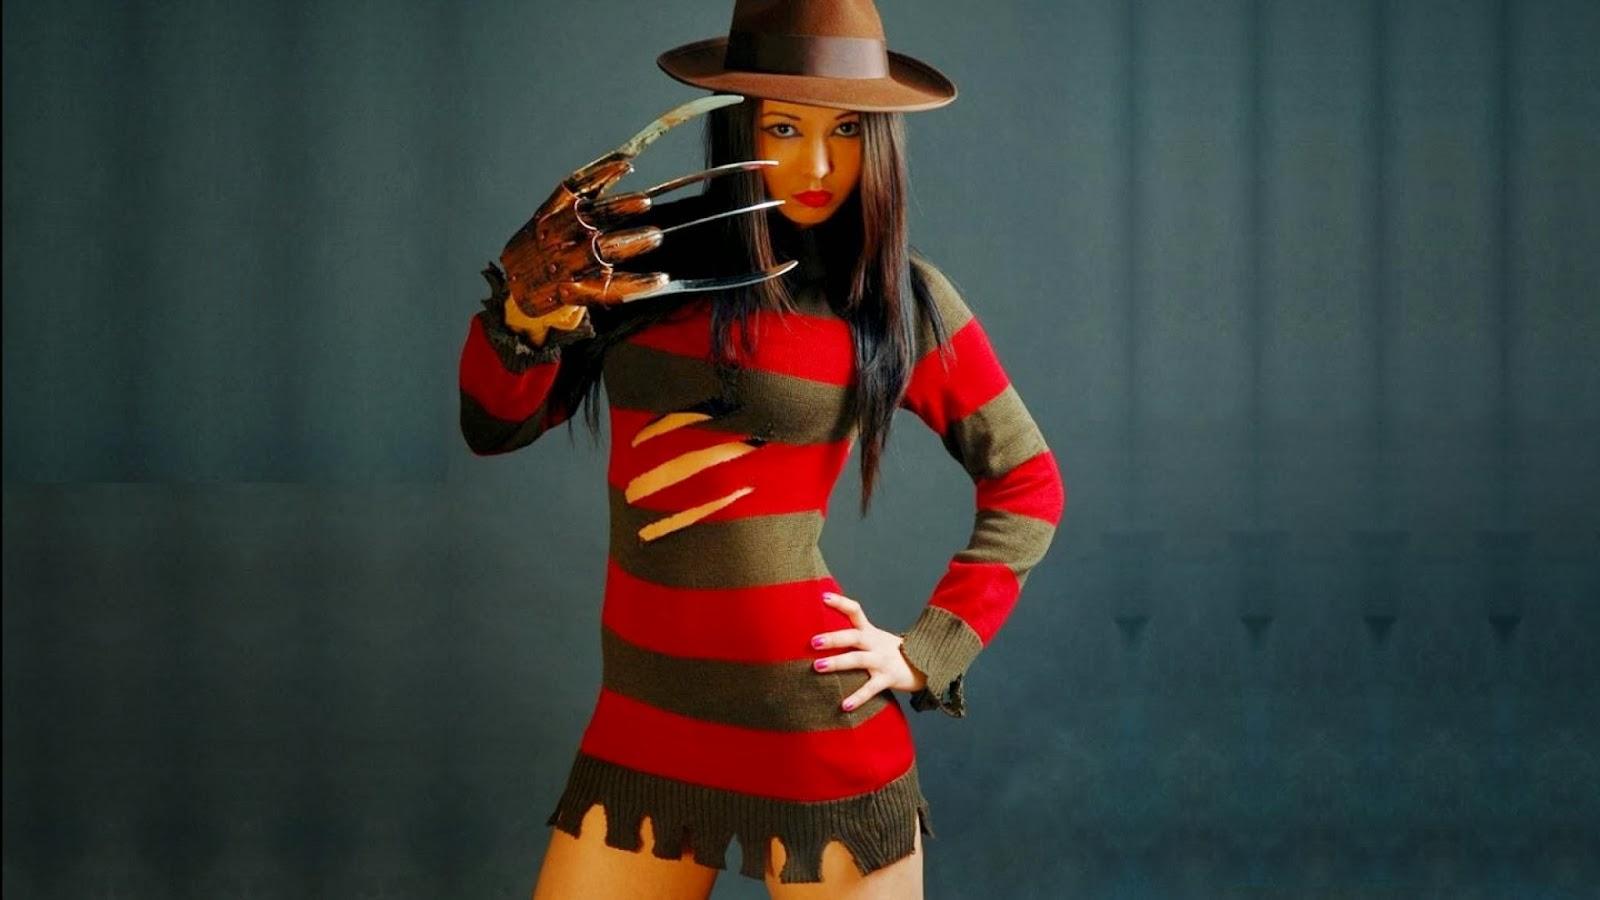 Freddy Krueger Wallpapers HD Window Top Rated 1600x900